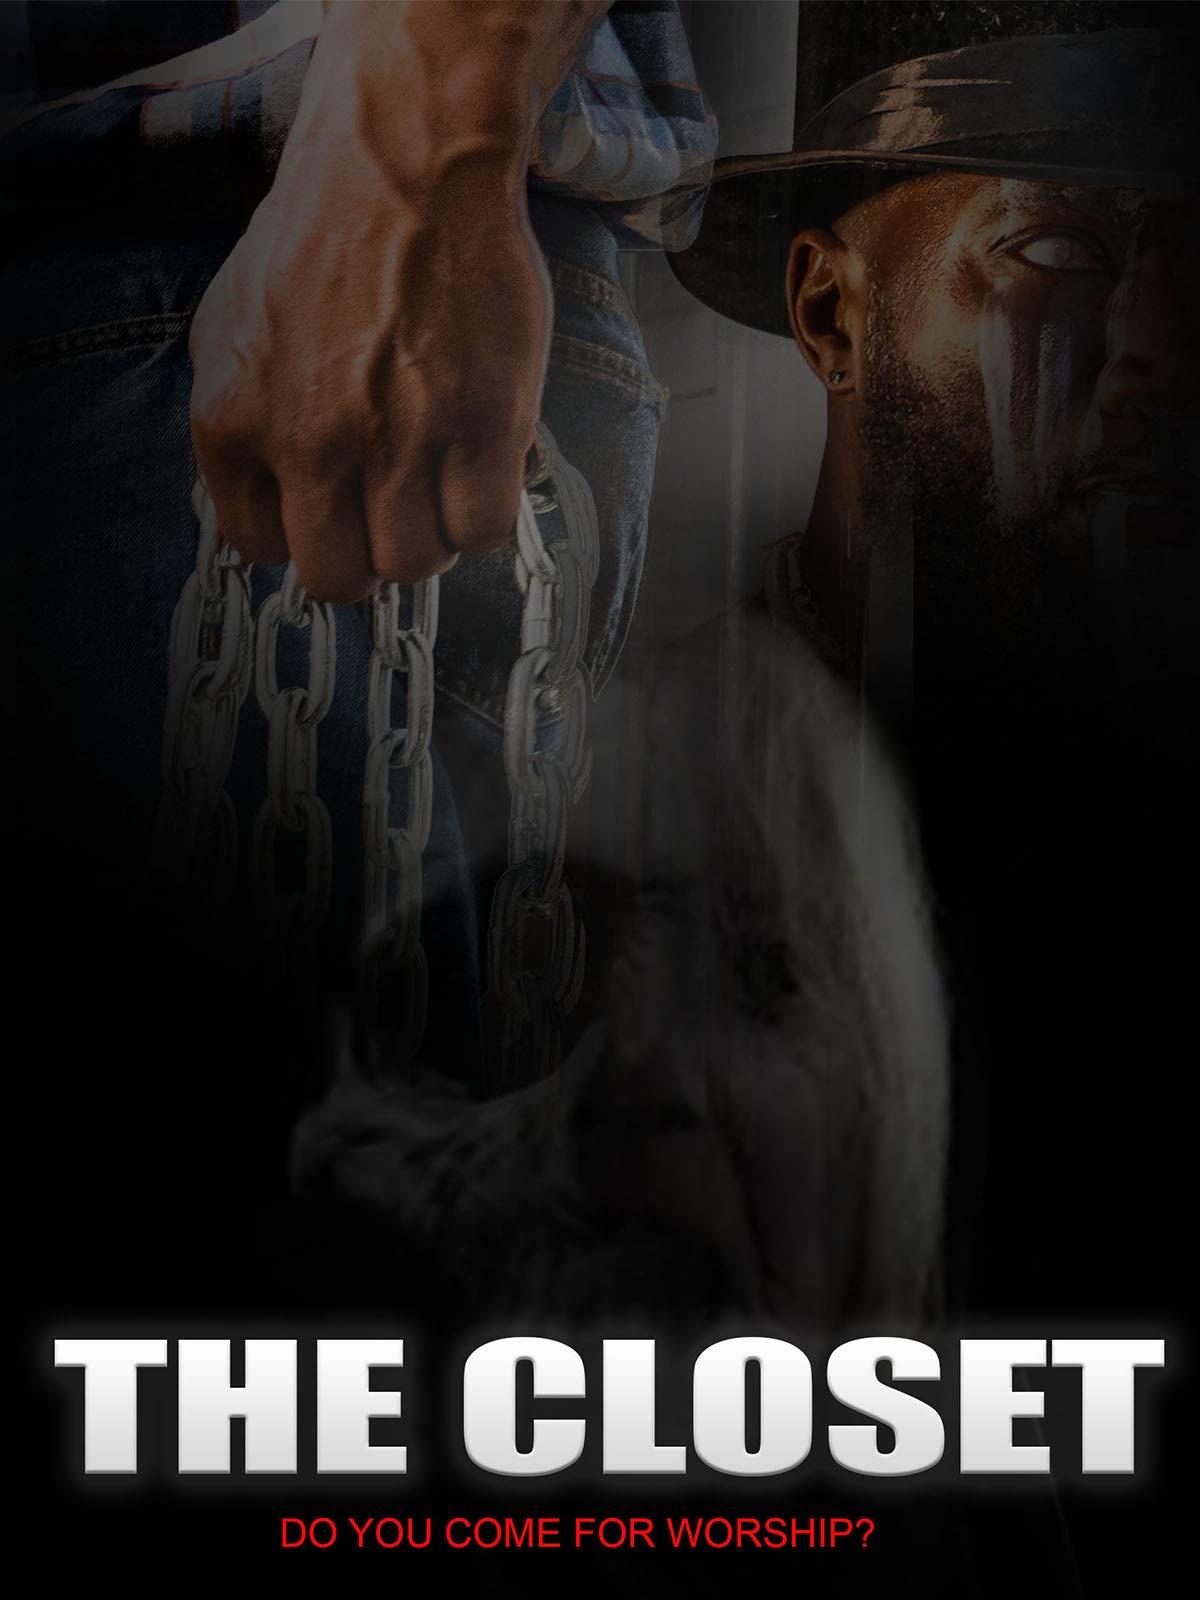 The Closet